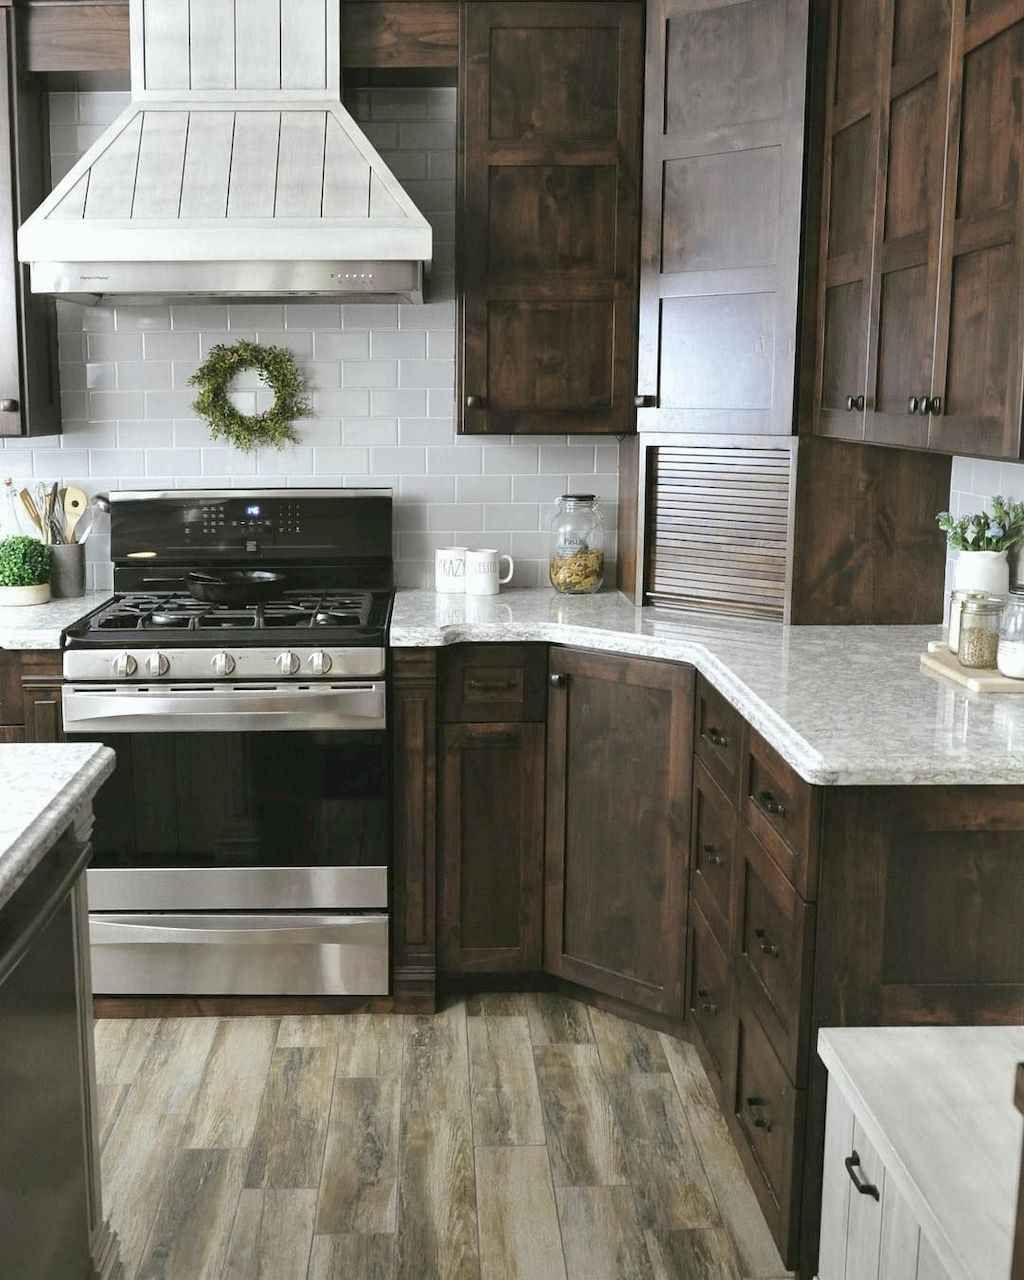 40 brilliant kitchen cabinet organization and tips ideas in 2020 dark grey kitchen cabinets on kitchen ideas gray id=80197